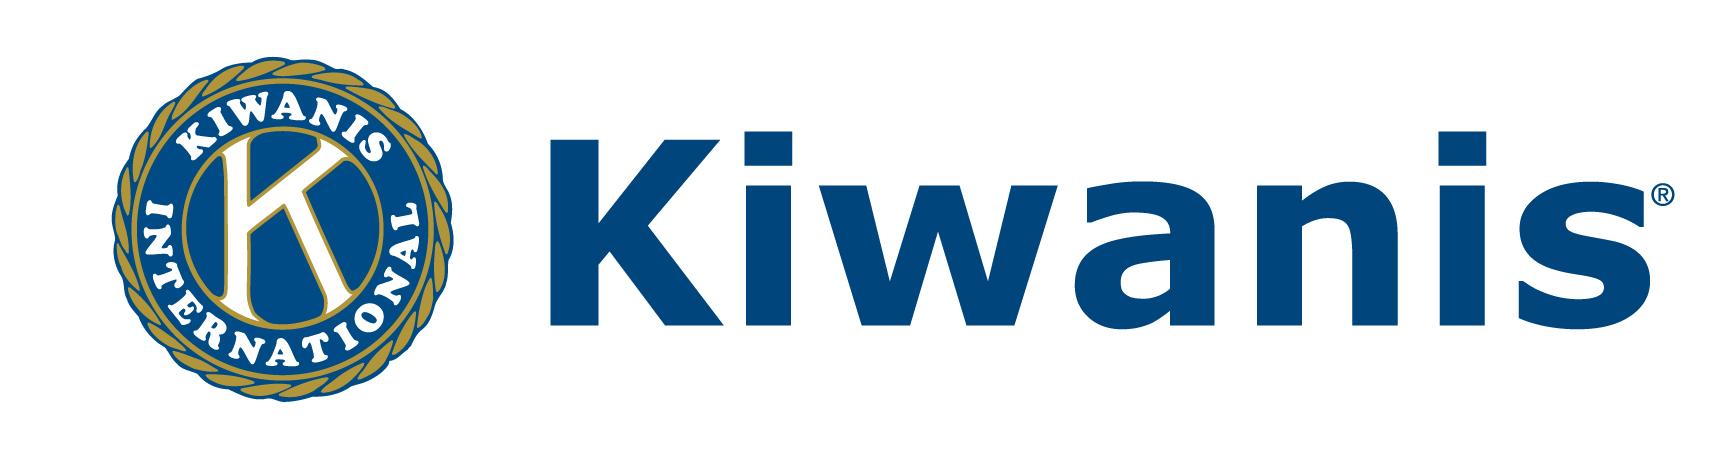 kiwanis_c1